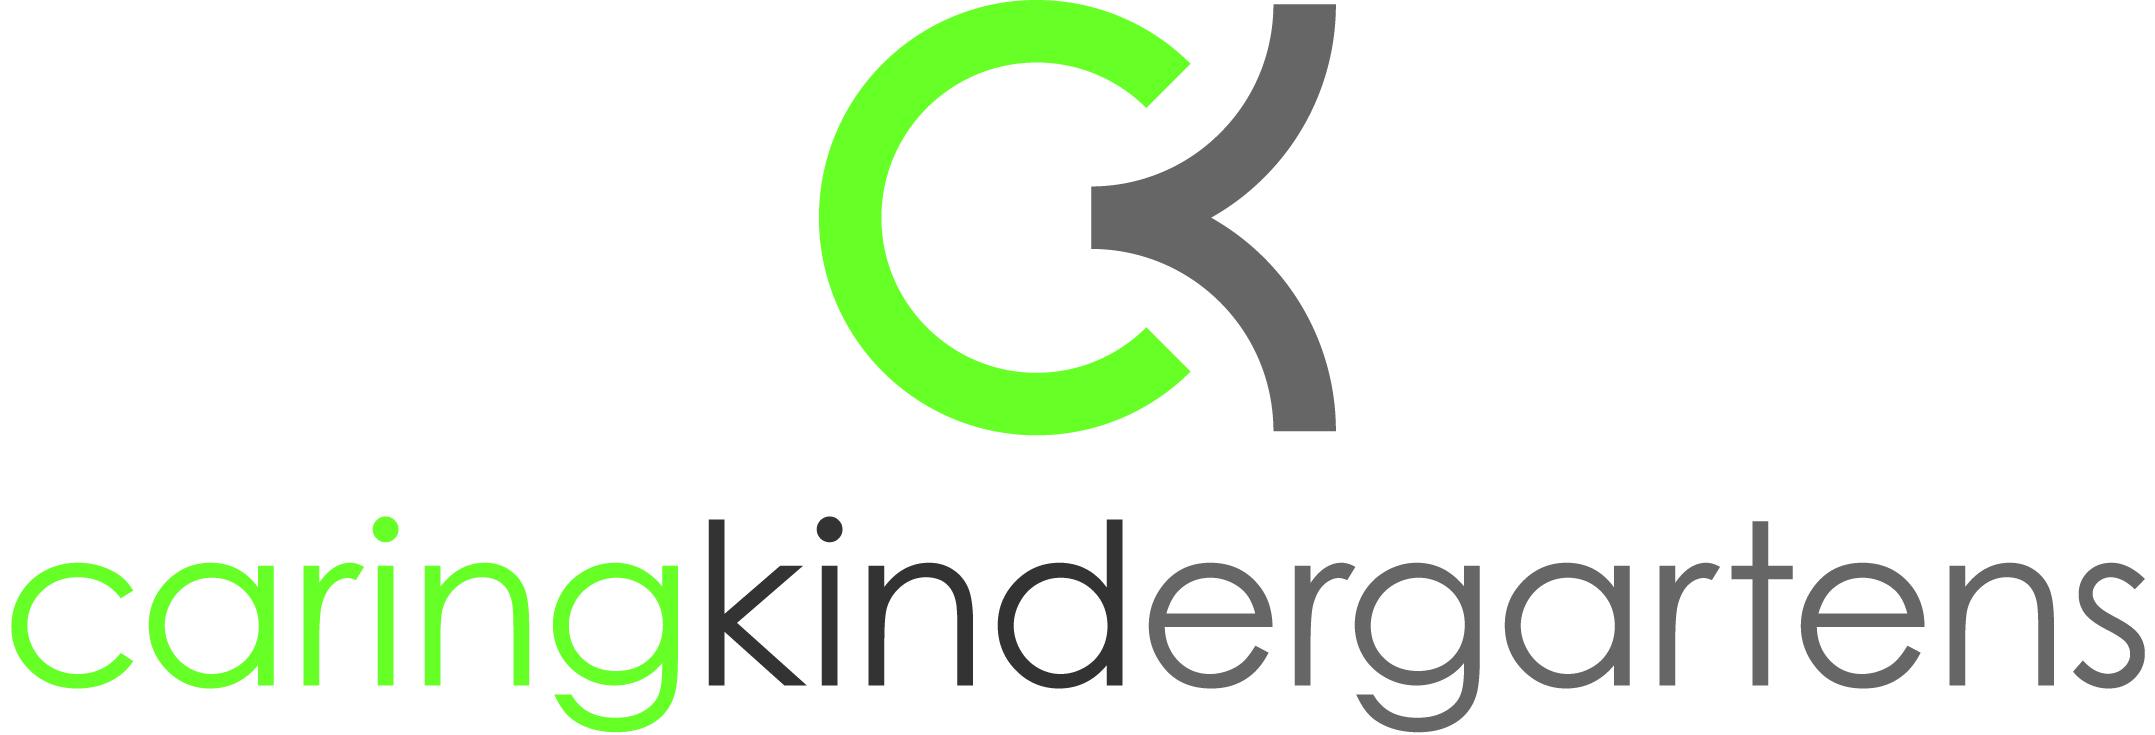 Caring Kindergarten logo